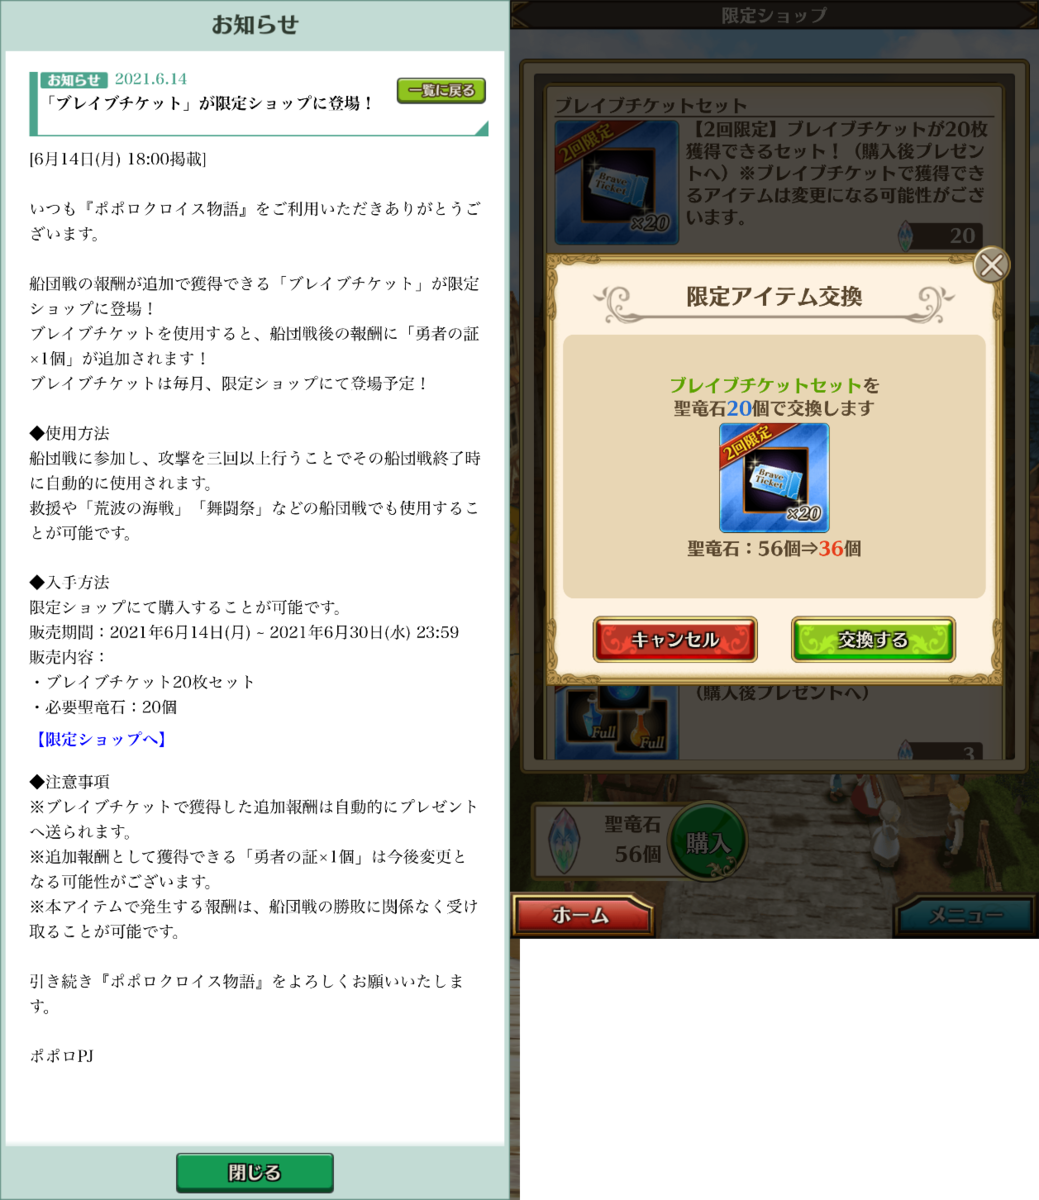 f:id:saki_yukino:20210725022100p:plain